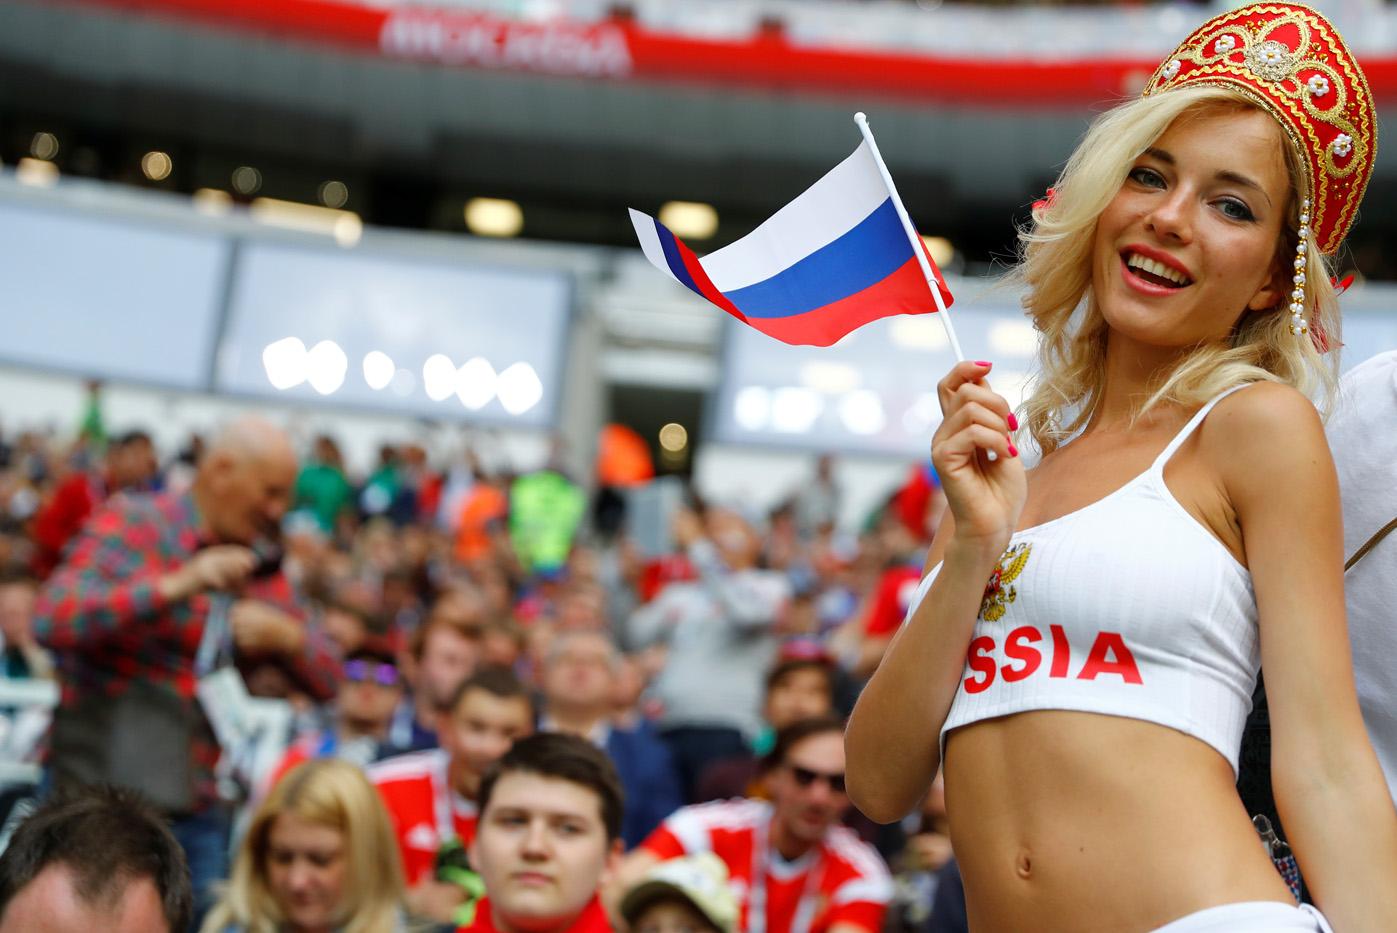 2018-06-14t143224z_1492256806_rc1345350e80_rtrmadp_3_soccer-worldcup-rus-sau-1.jpg